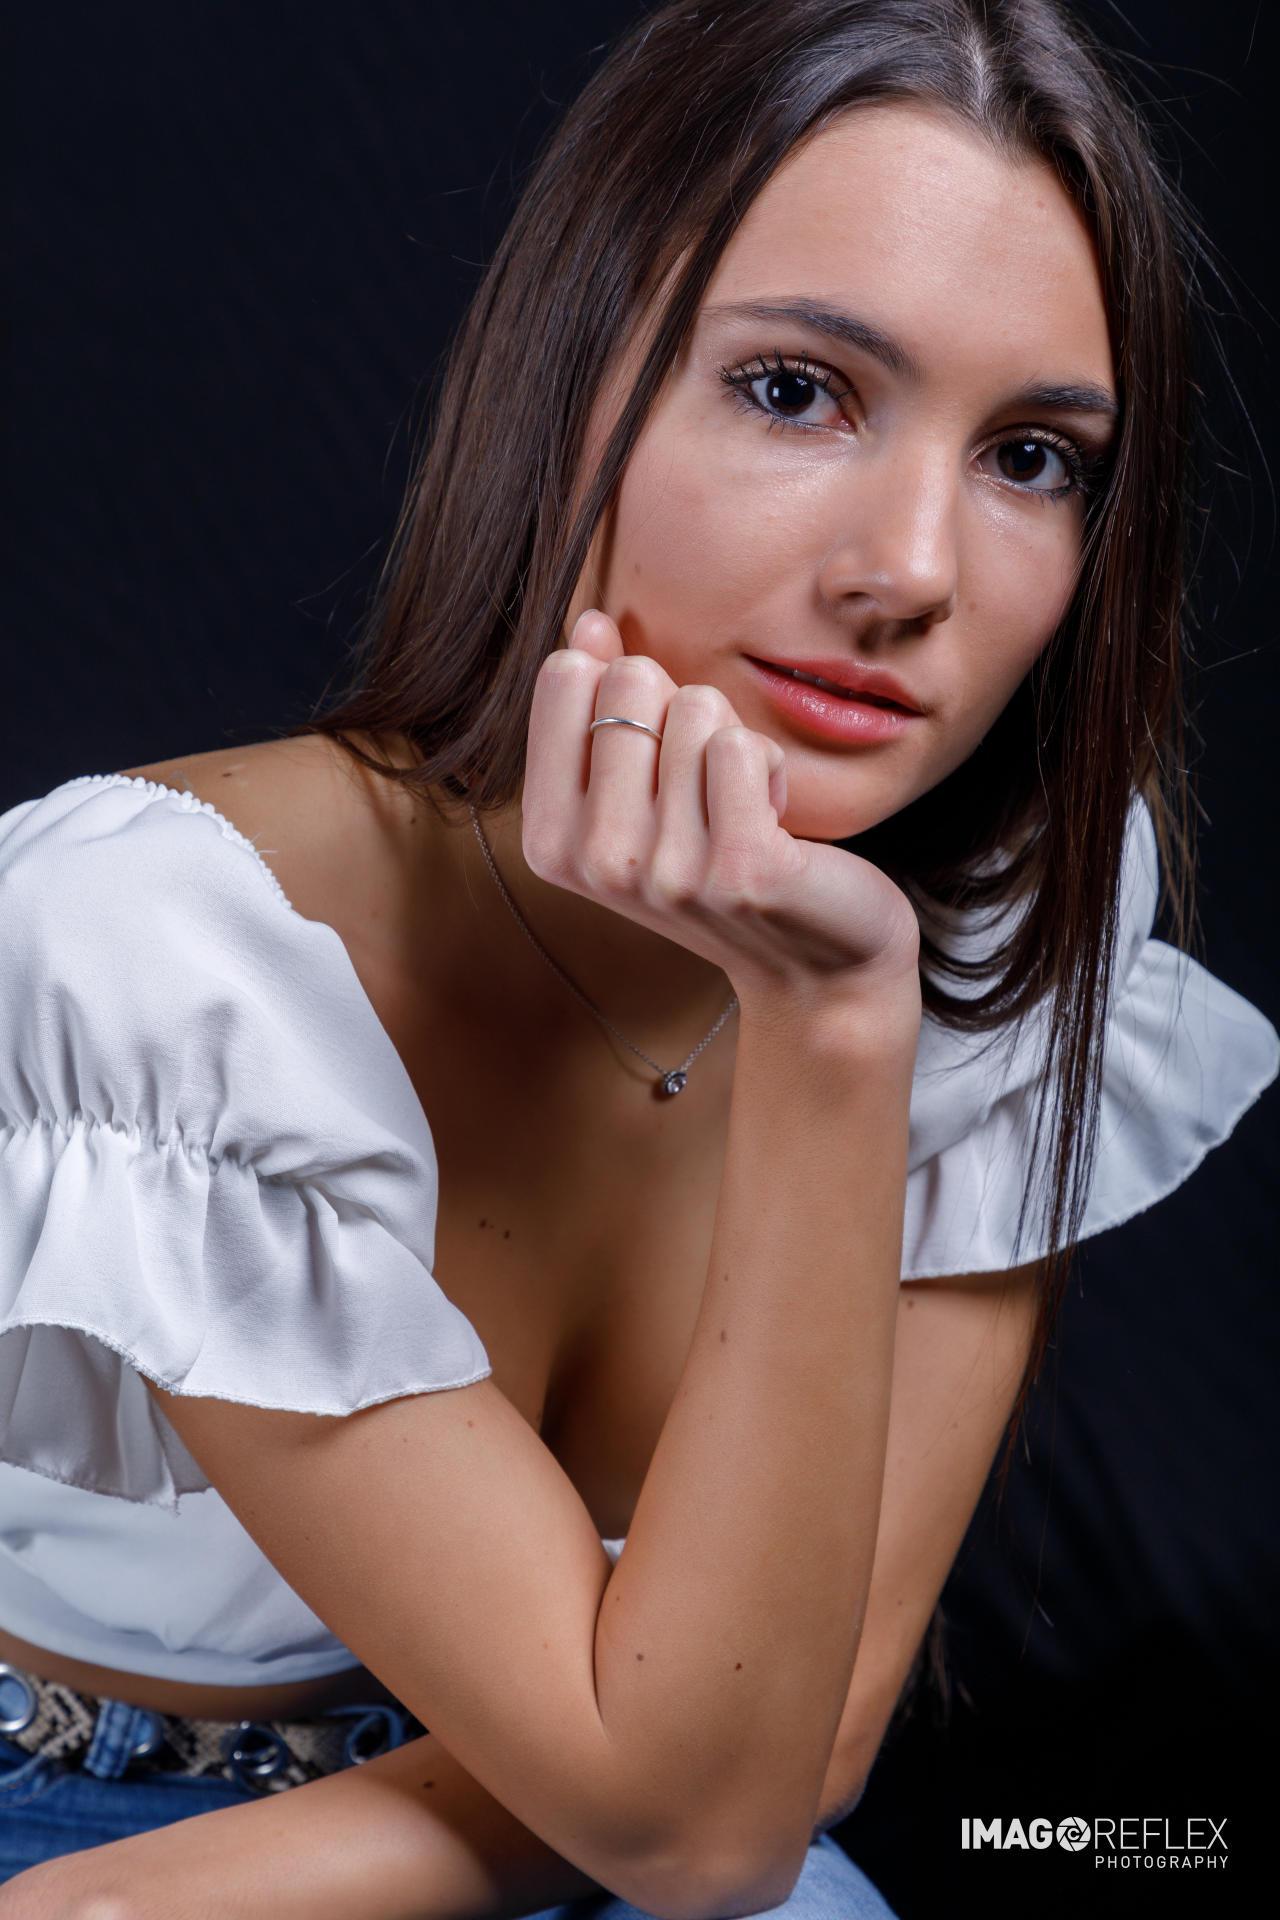 Teresa Vidoz